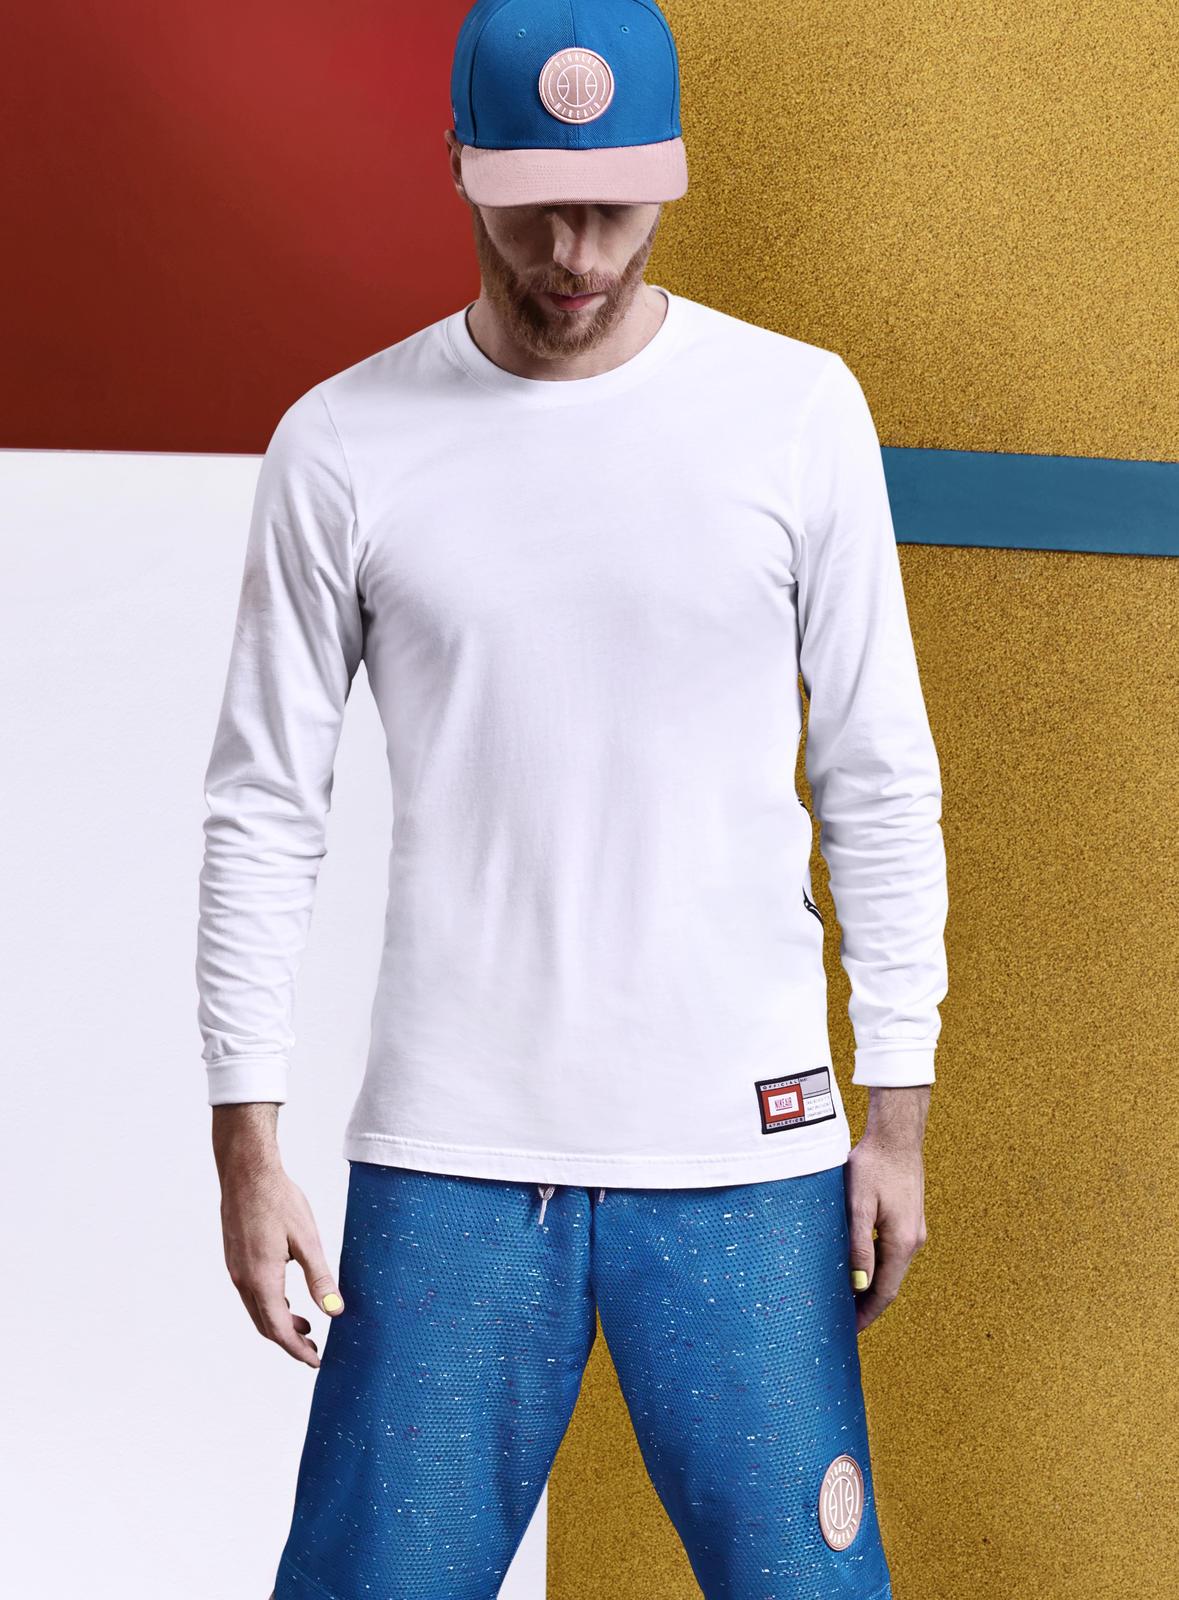 Stéphane Ashpool, NikeLab x Pigalle